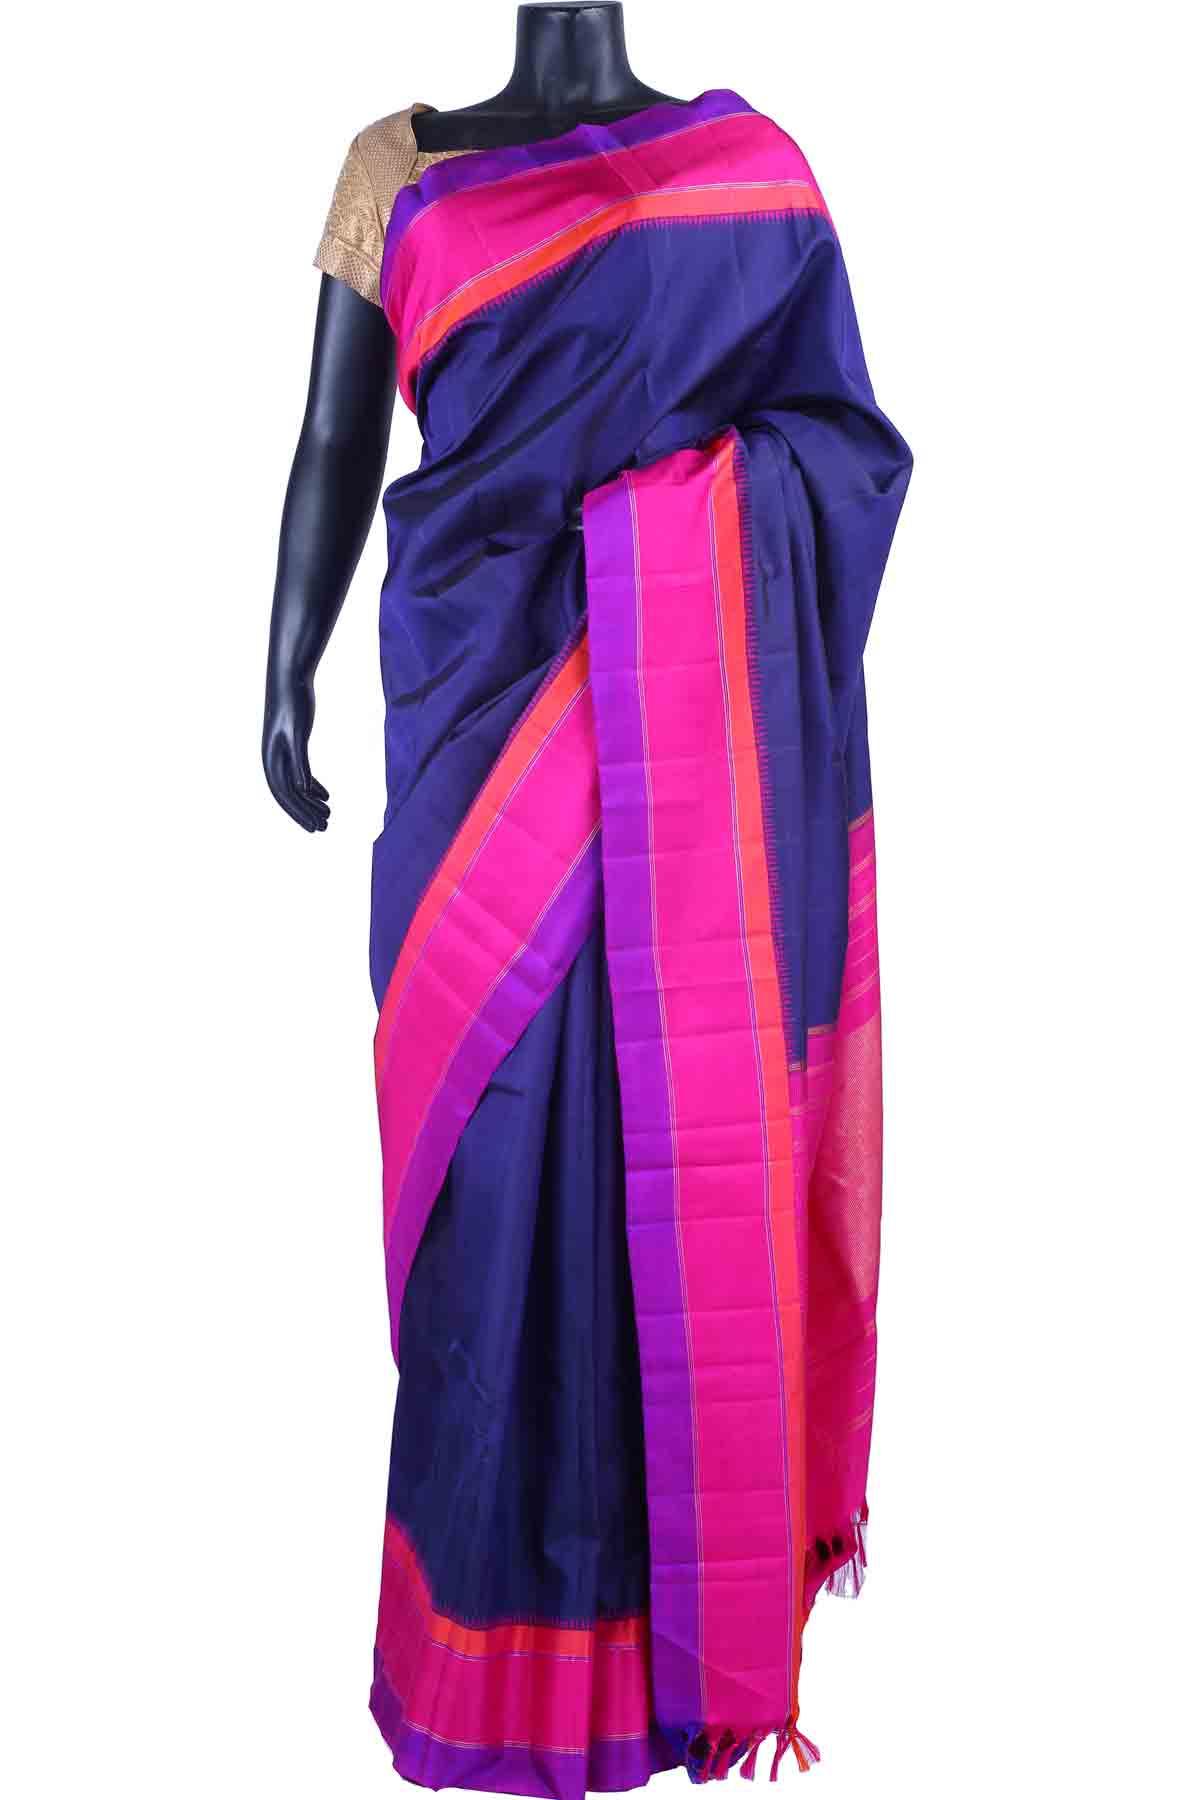 1533fdc130084d Dark blue pure silk plain saree in pink pallu   multi colour border-sr5498